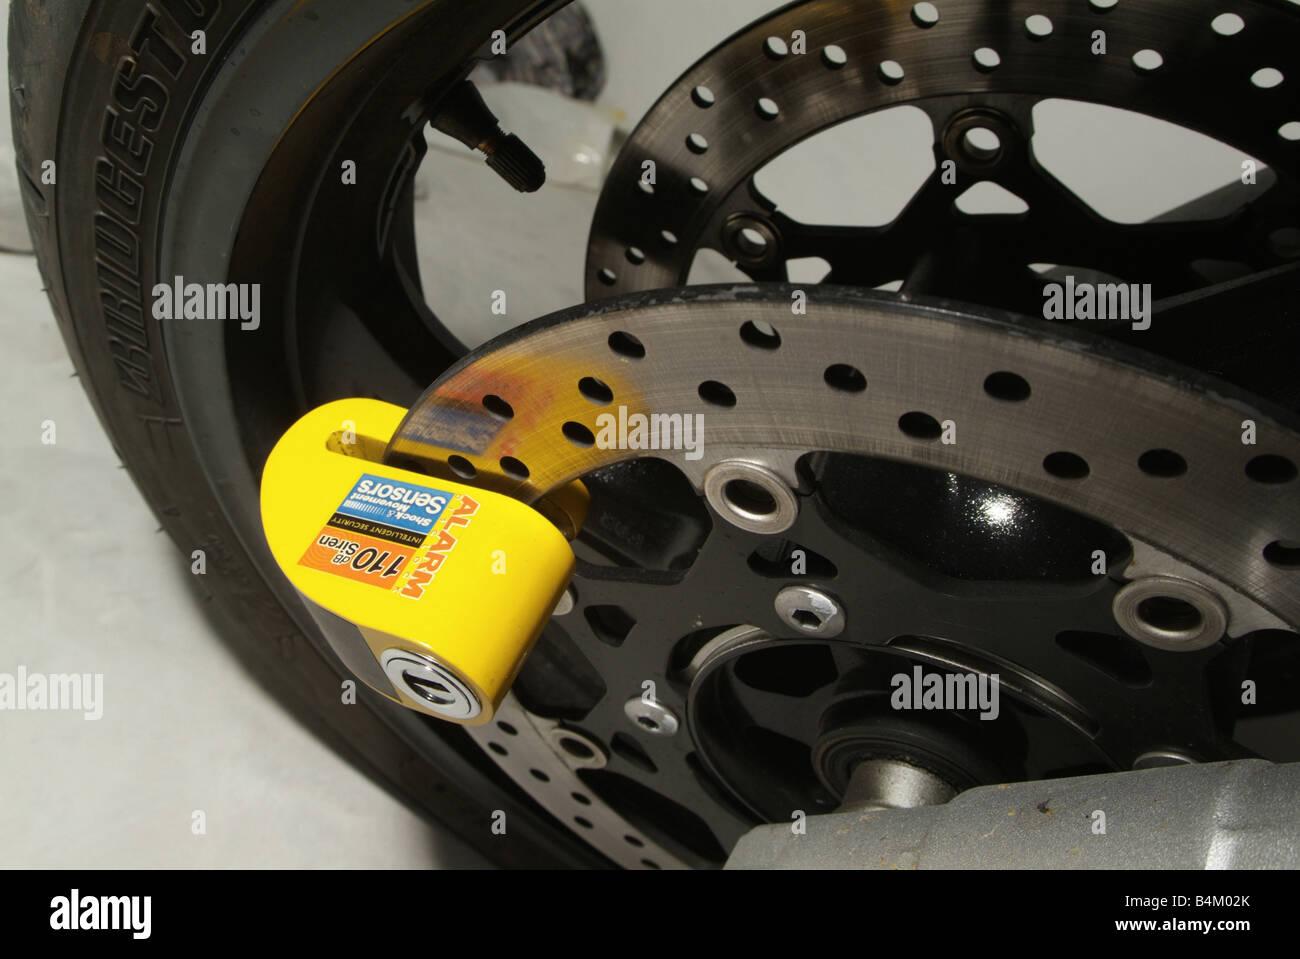 how to break a motorcycle disc lock